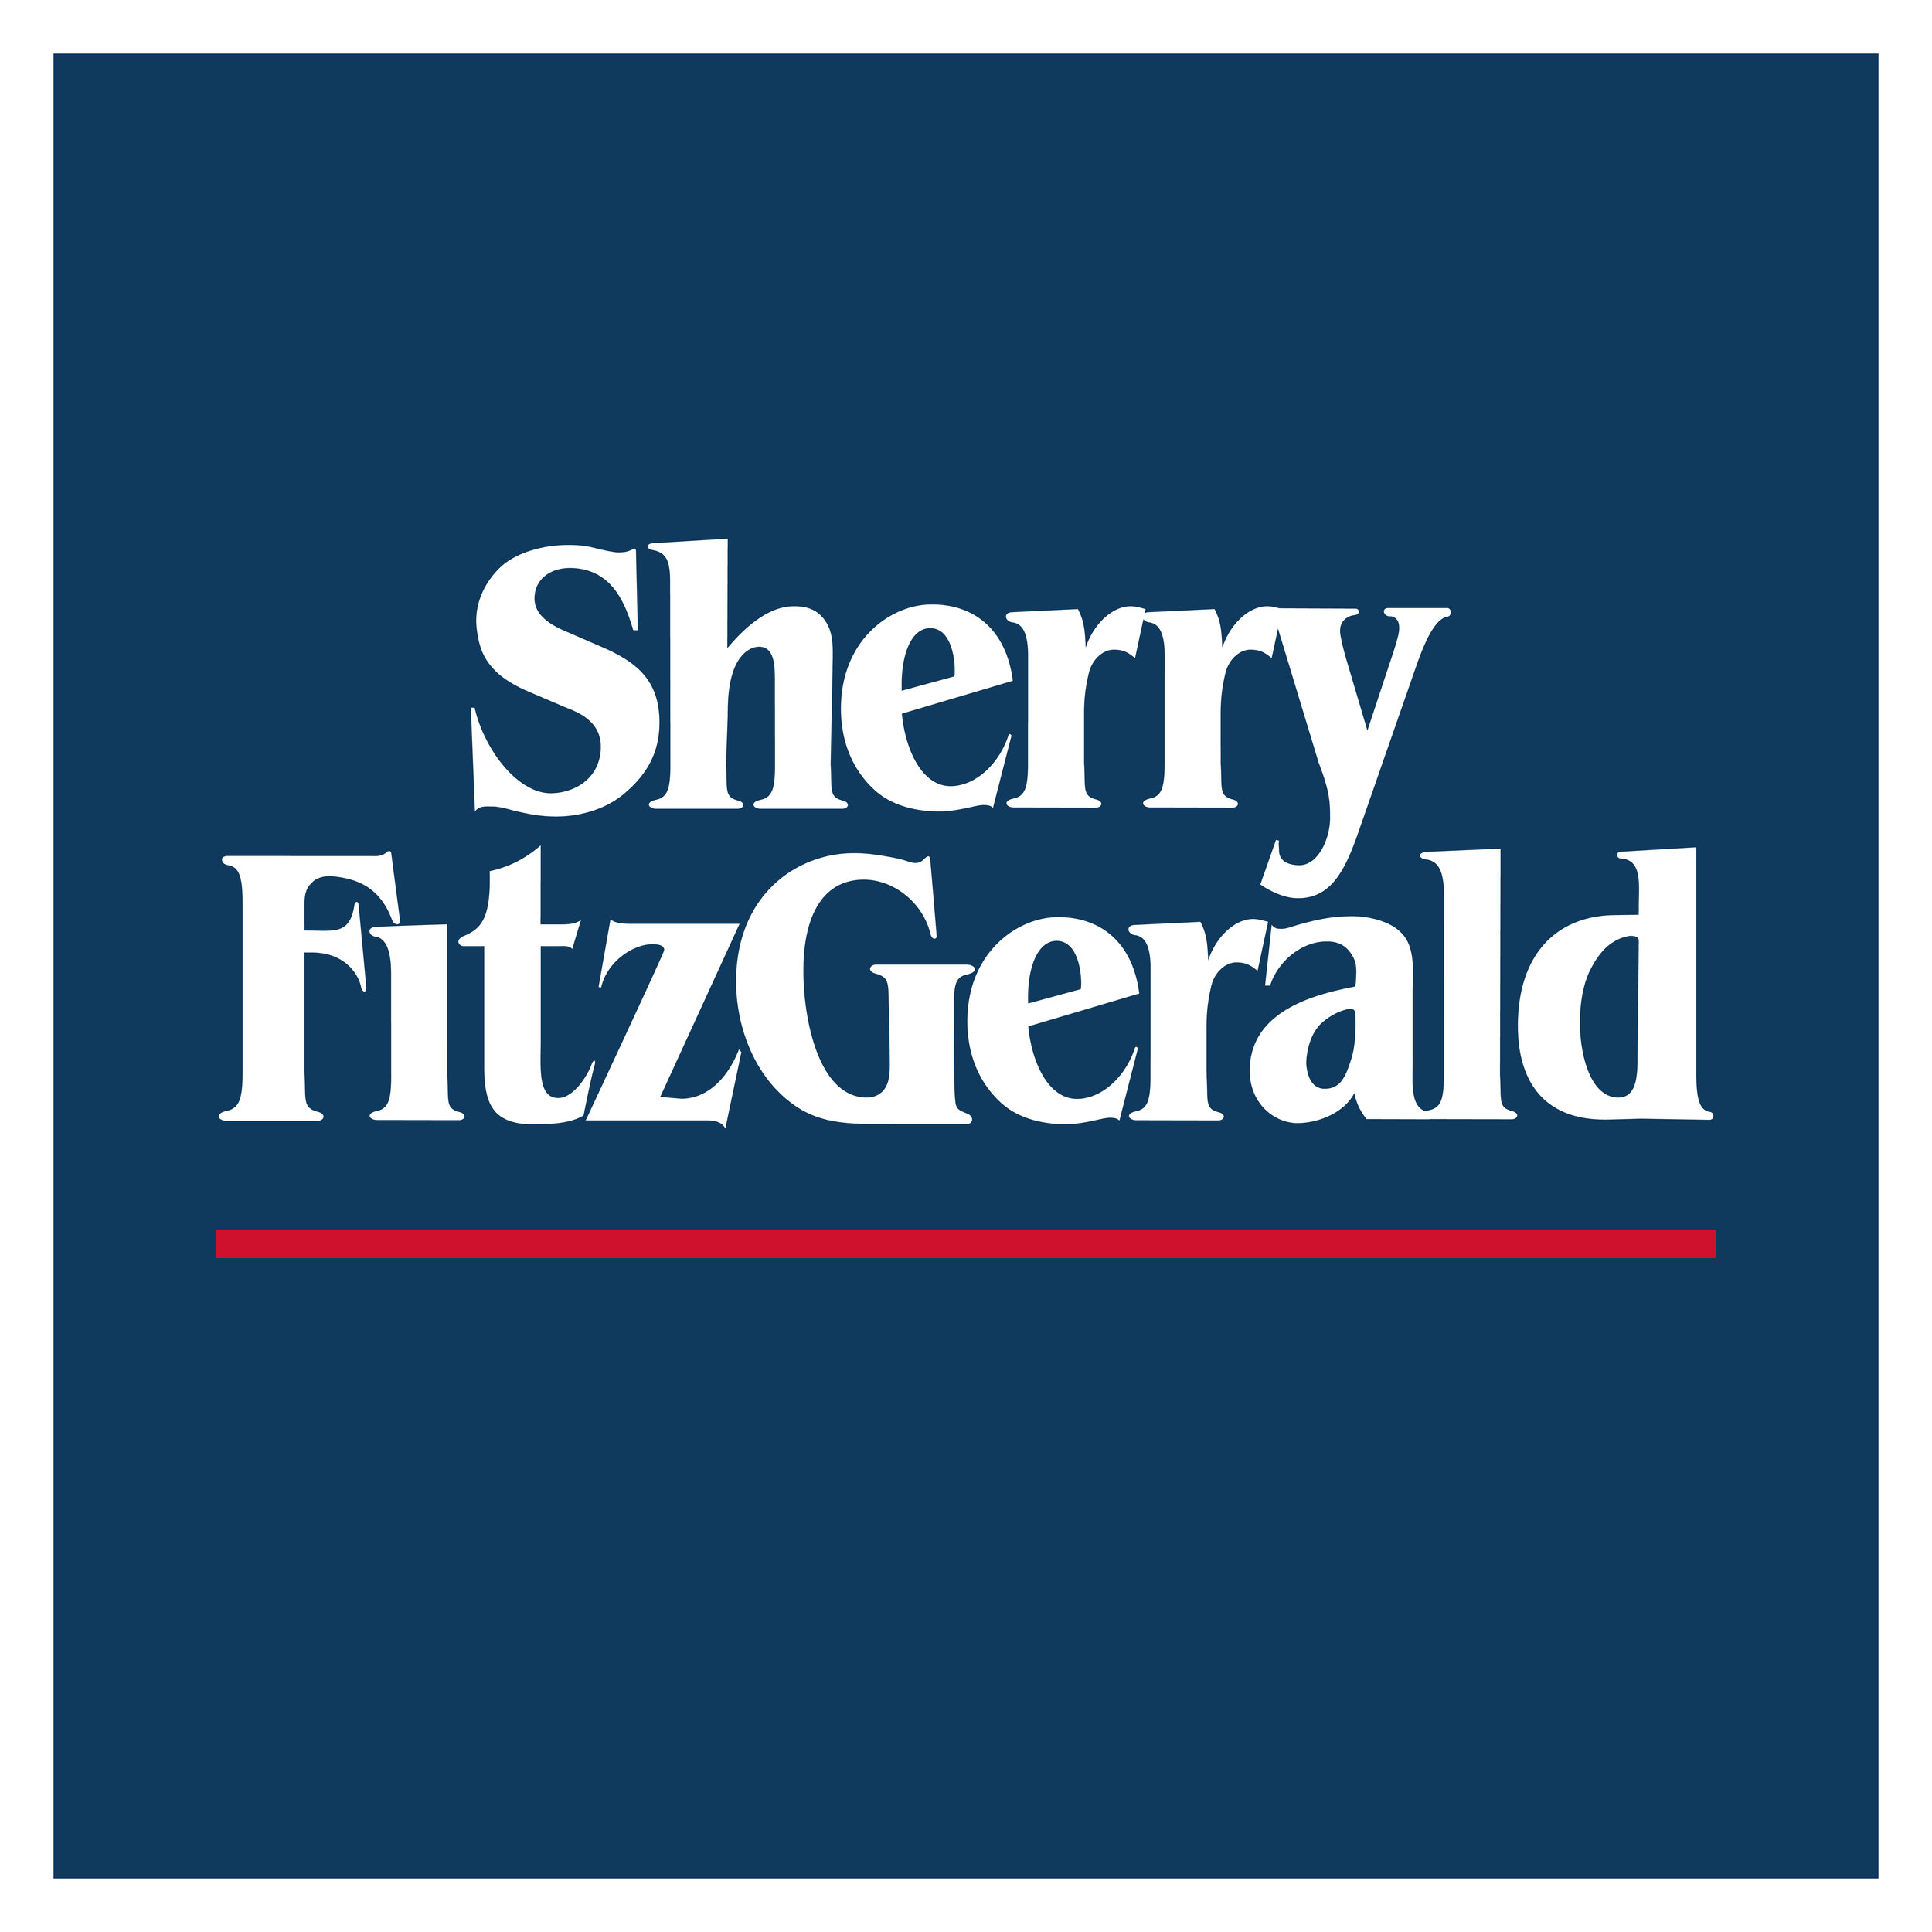 SherryFItzgerald.png